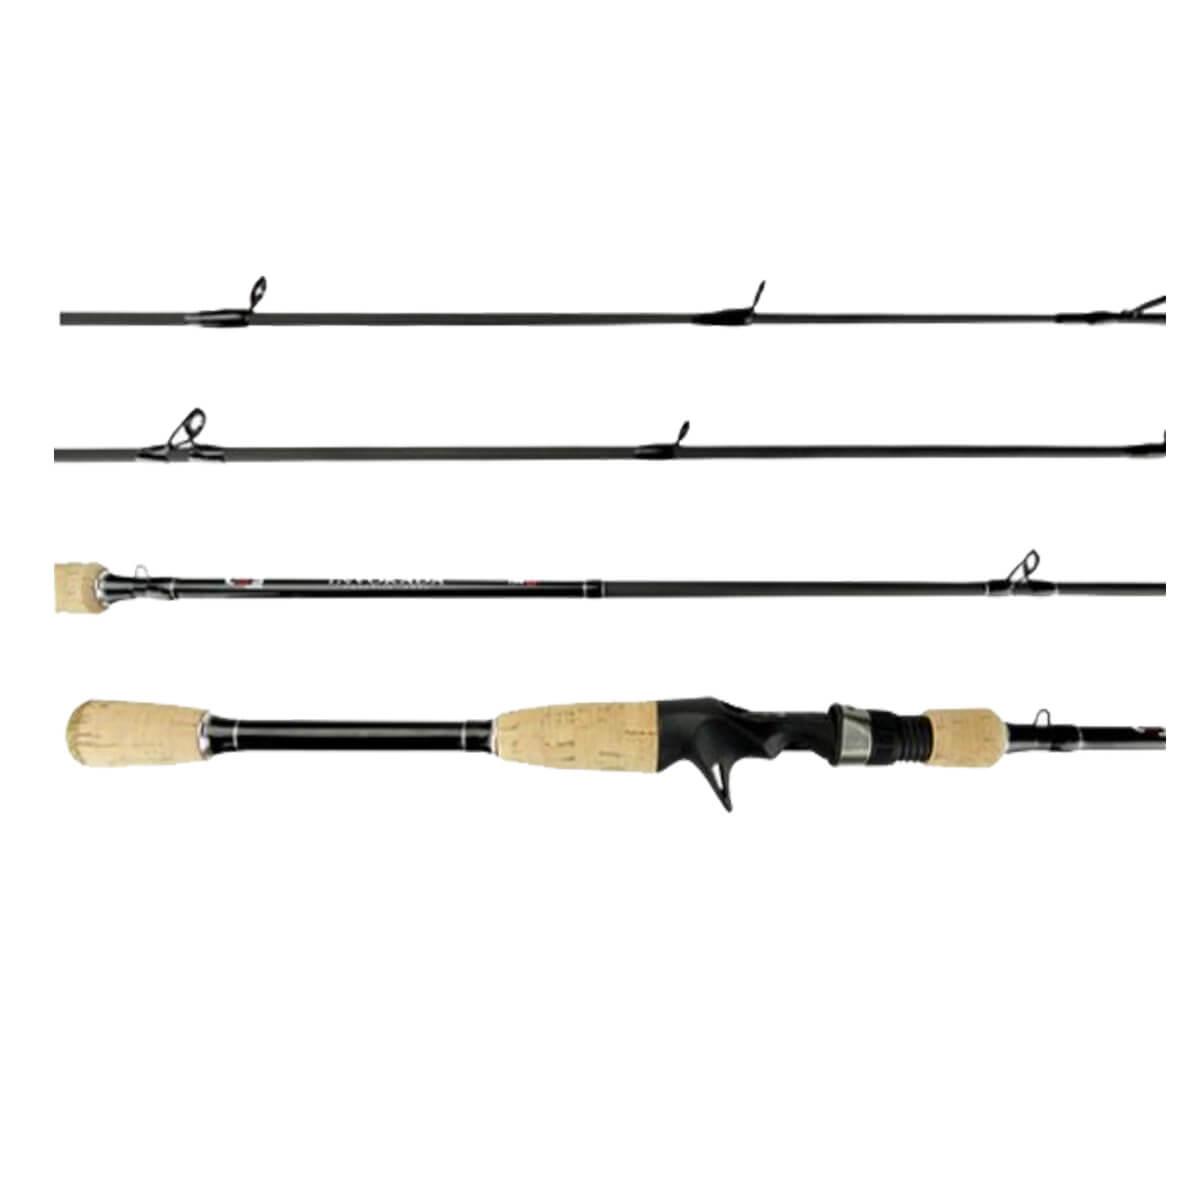 Vara Lumis Invokada p/ Carretilha 2,40 m 50 lbs (2 partes)  - Pró Pesca Shop